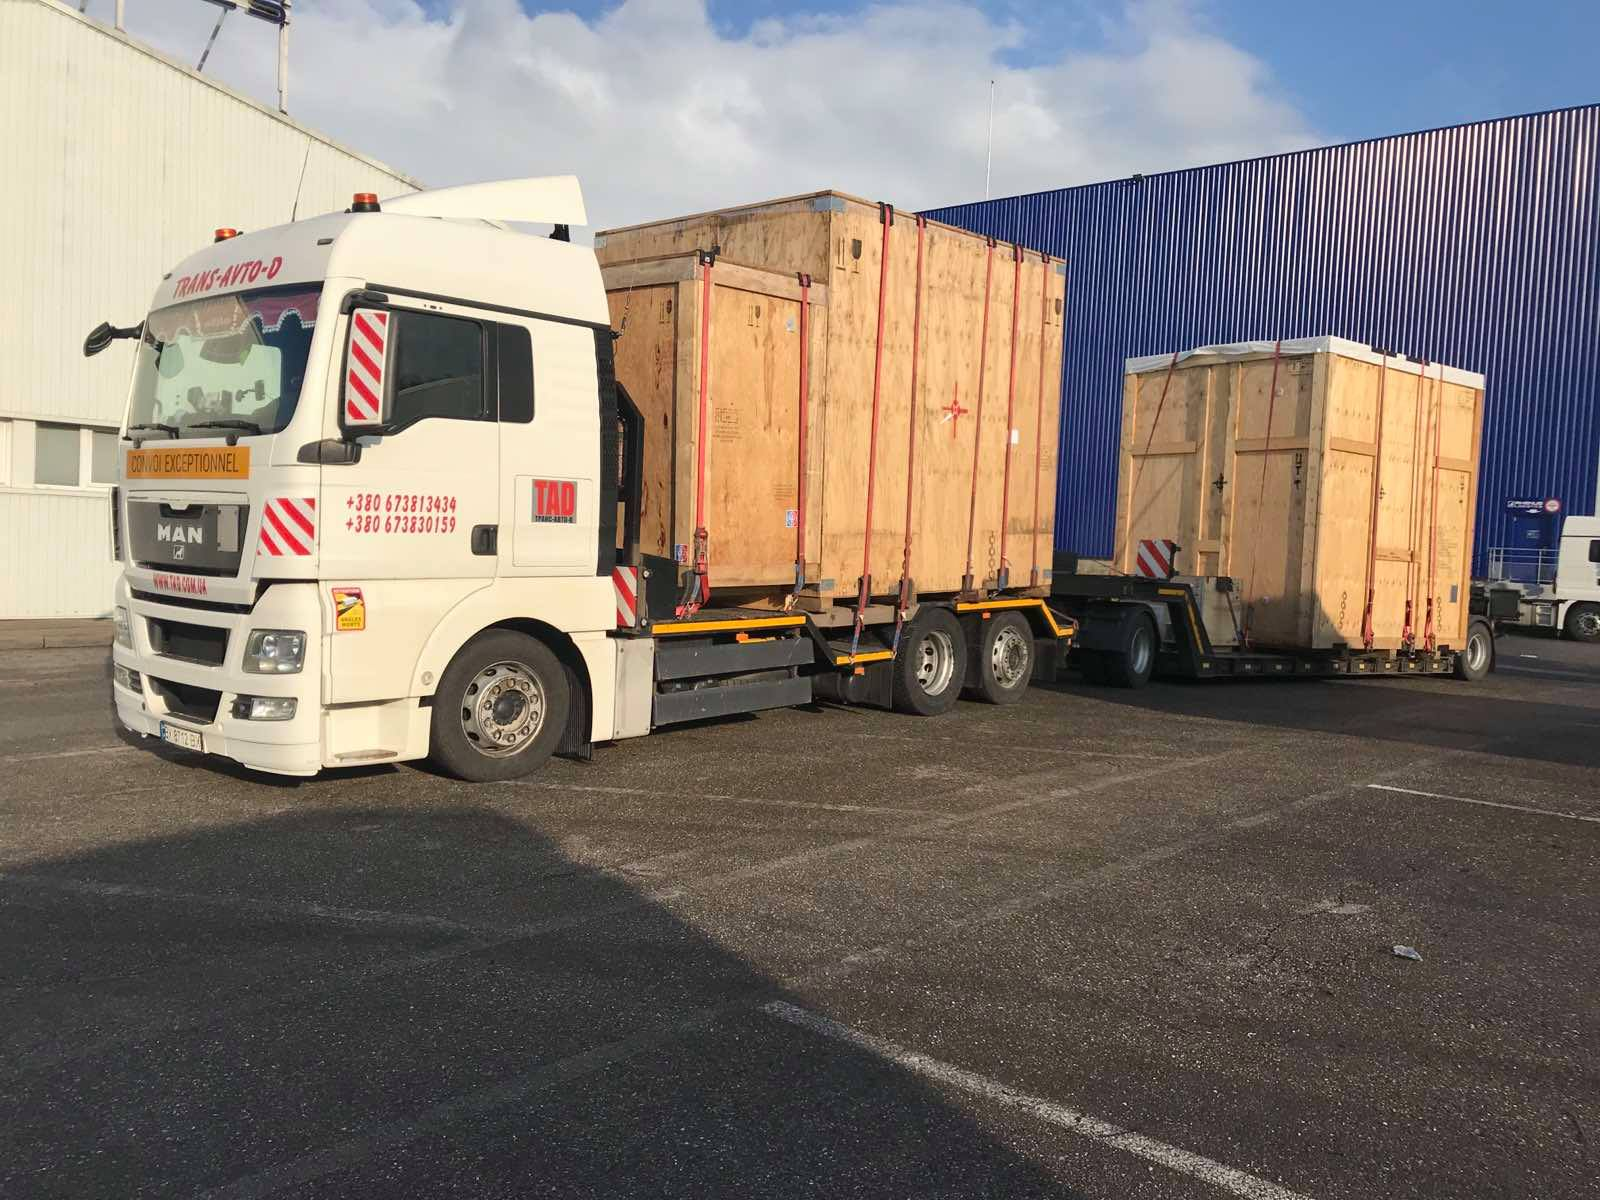 Transportation of industrial oversized cargo